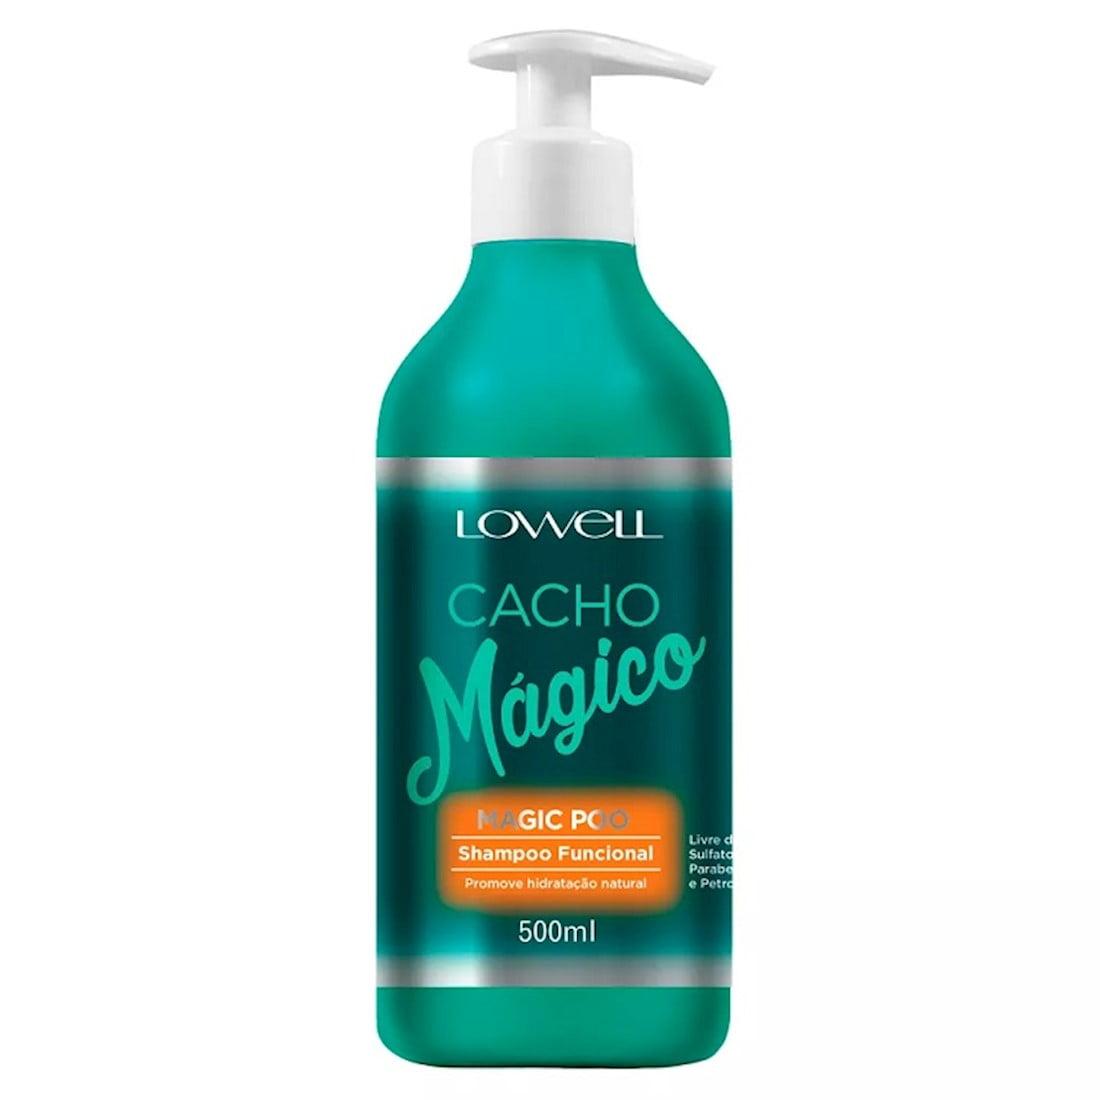 Cacho Mágico Shampoo Funcional Magic Poo 500ml - Lowell